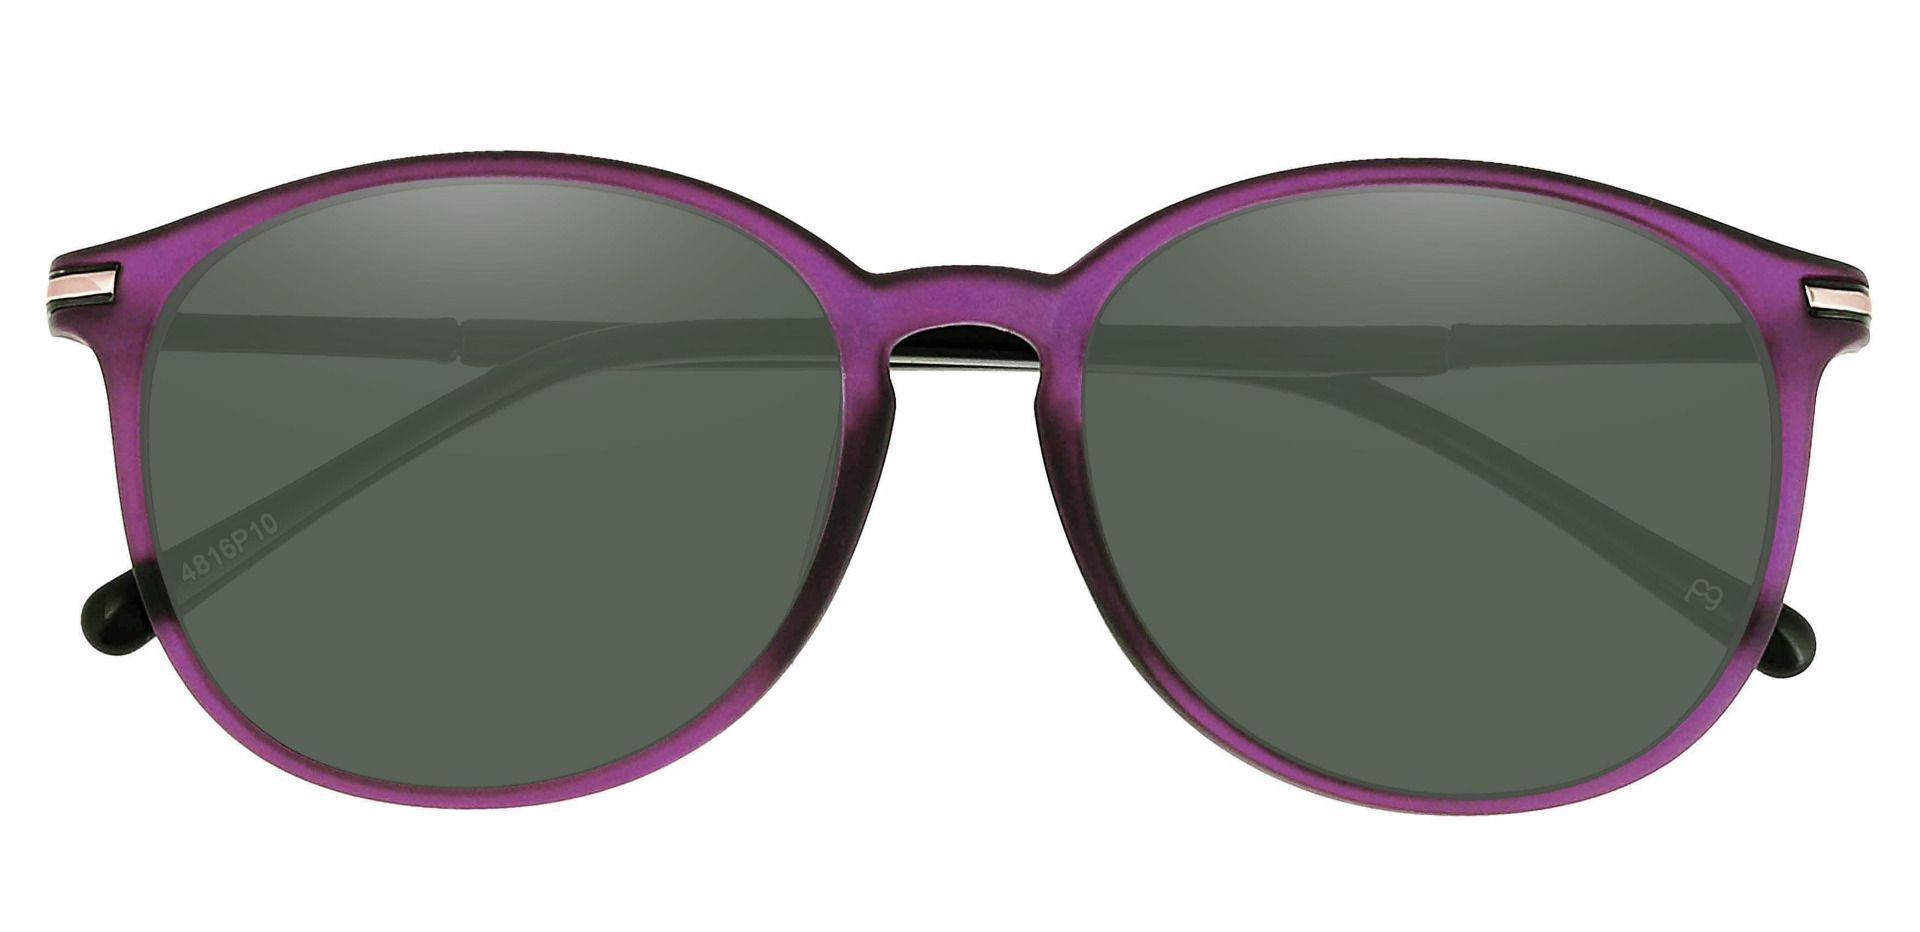 Danbury Oval Non-Rx Sunglasses - Purple Frame With Green Lenses